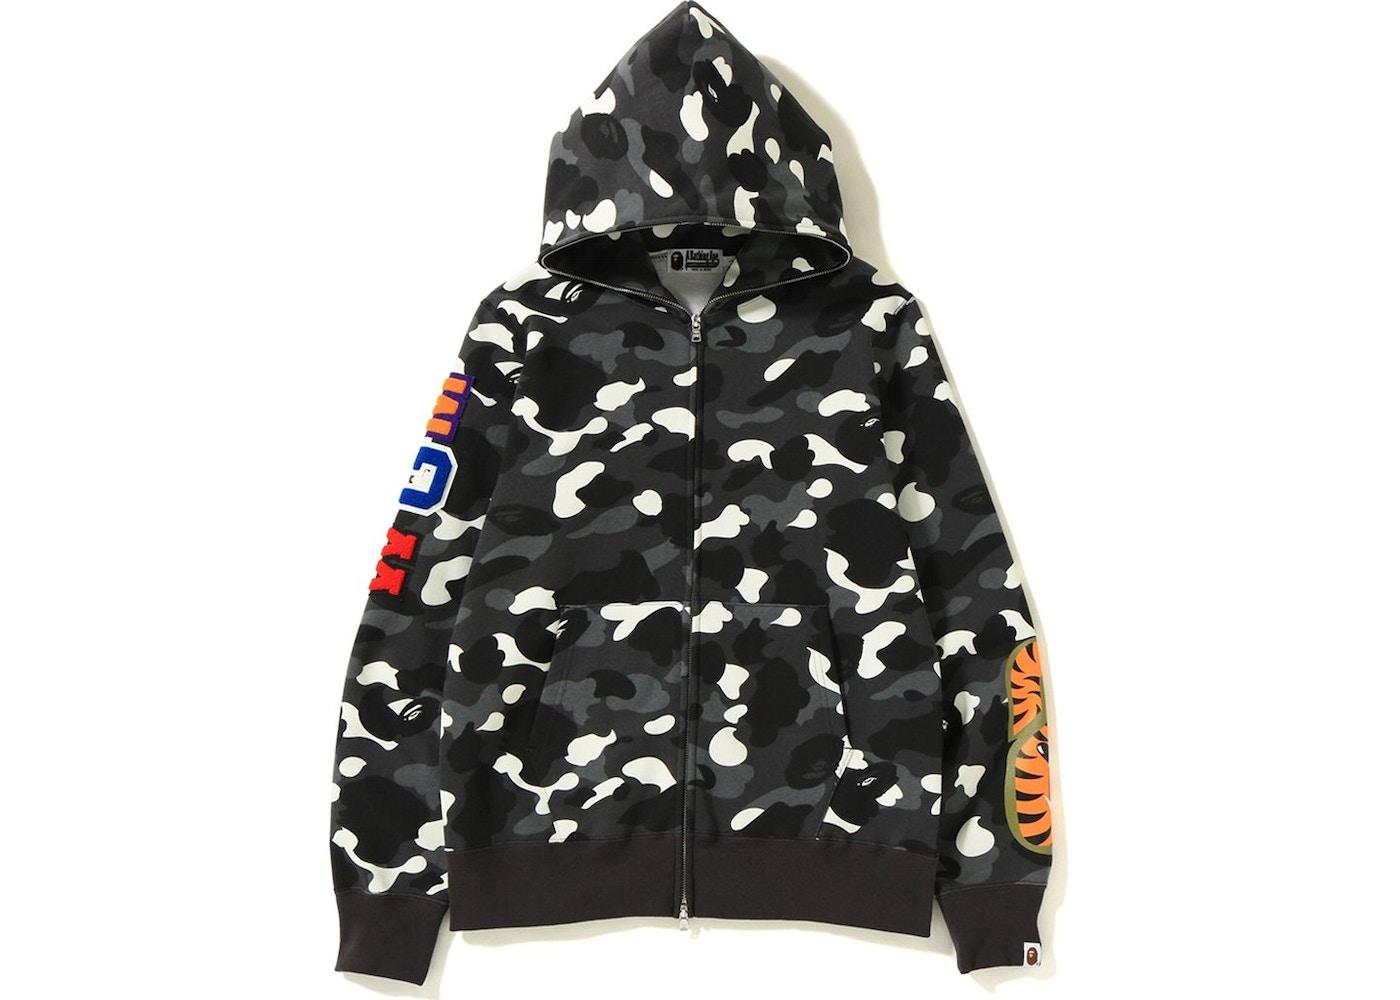 ce6f14e5b5cb BAPE City Camo Embroidery Shark Full Zip Hoodie Black - FW18